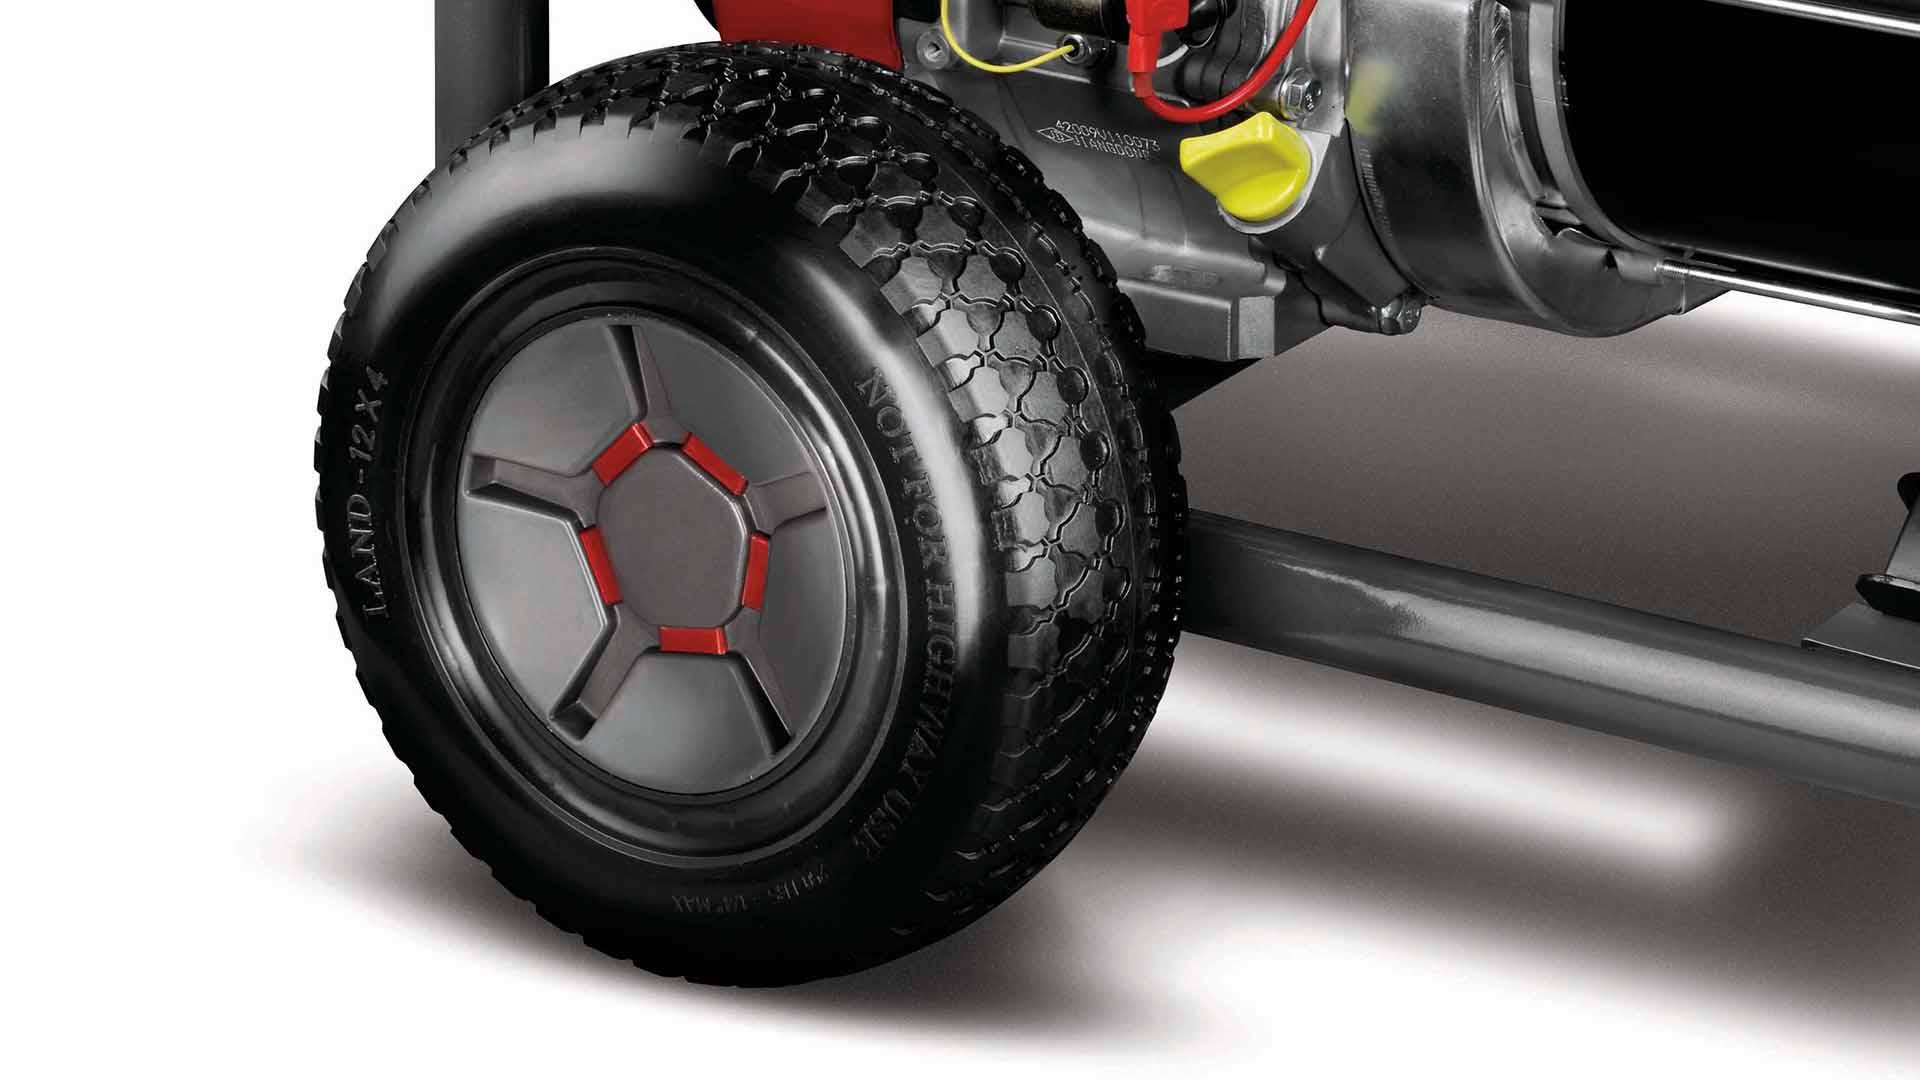 6250 Watt Portable Generator Wiring Diagram Rv Tank Level Monitor 10 Never Go Flat Wheels